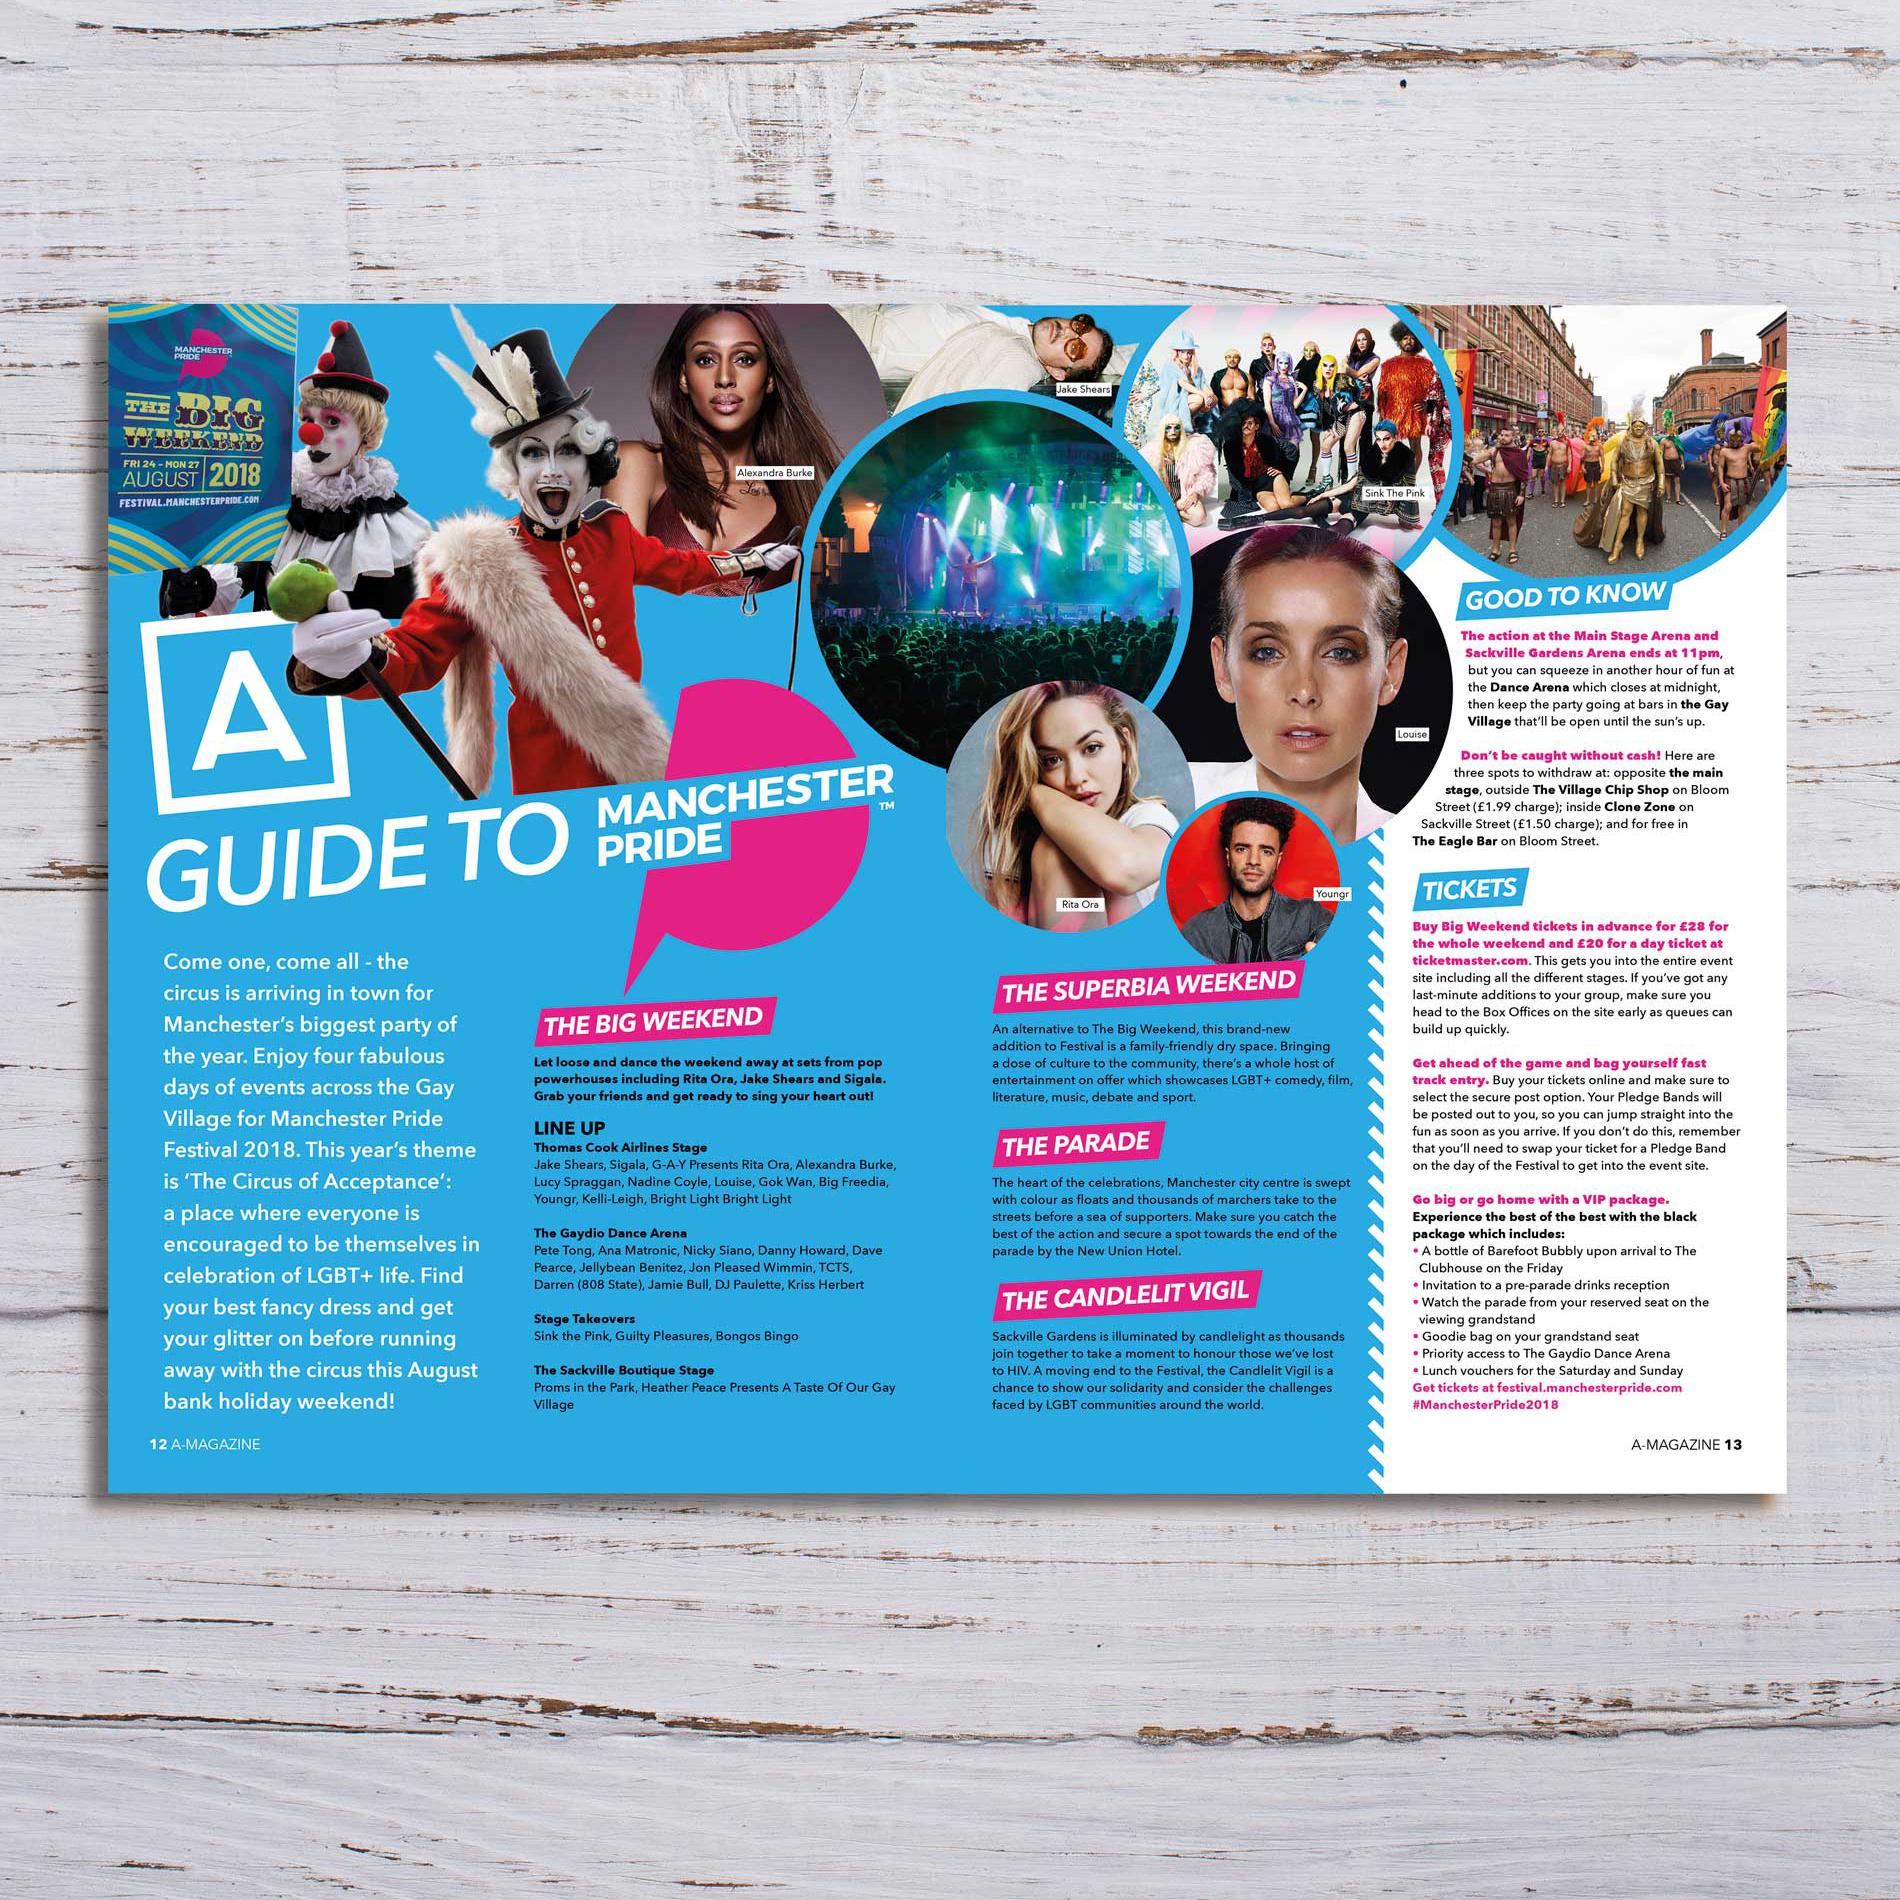 A-Magazine